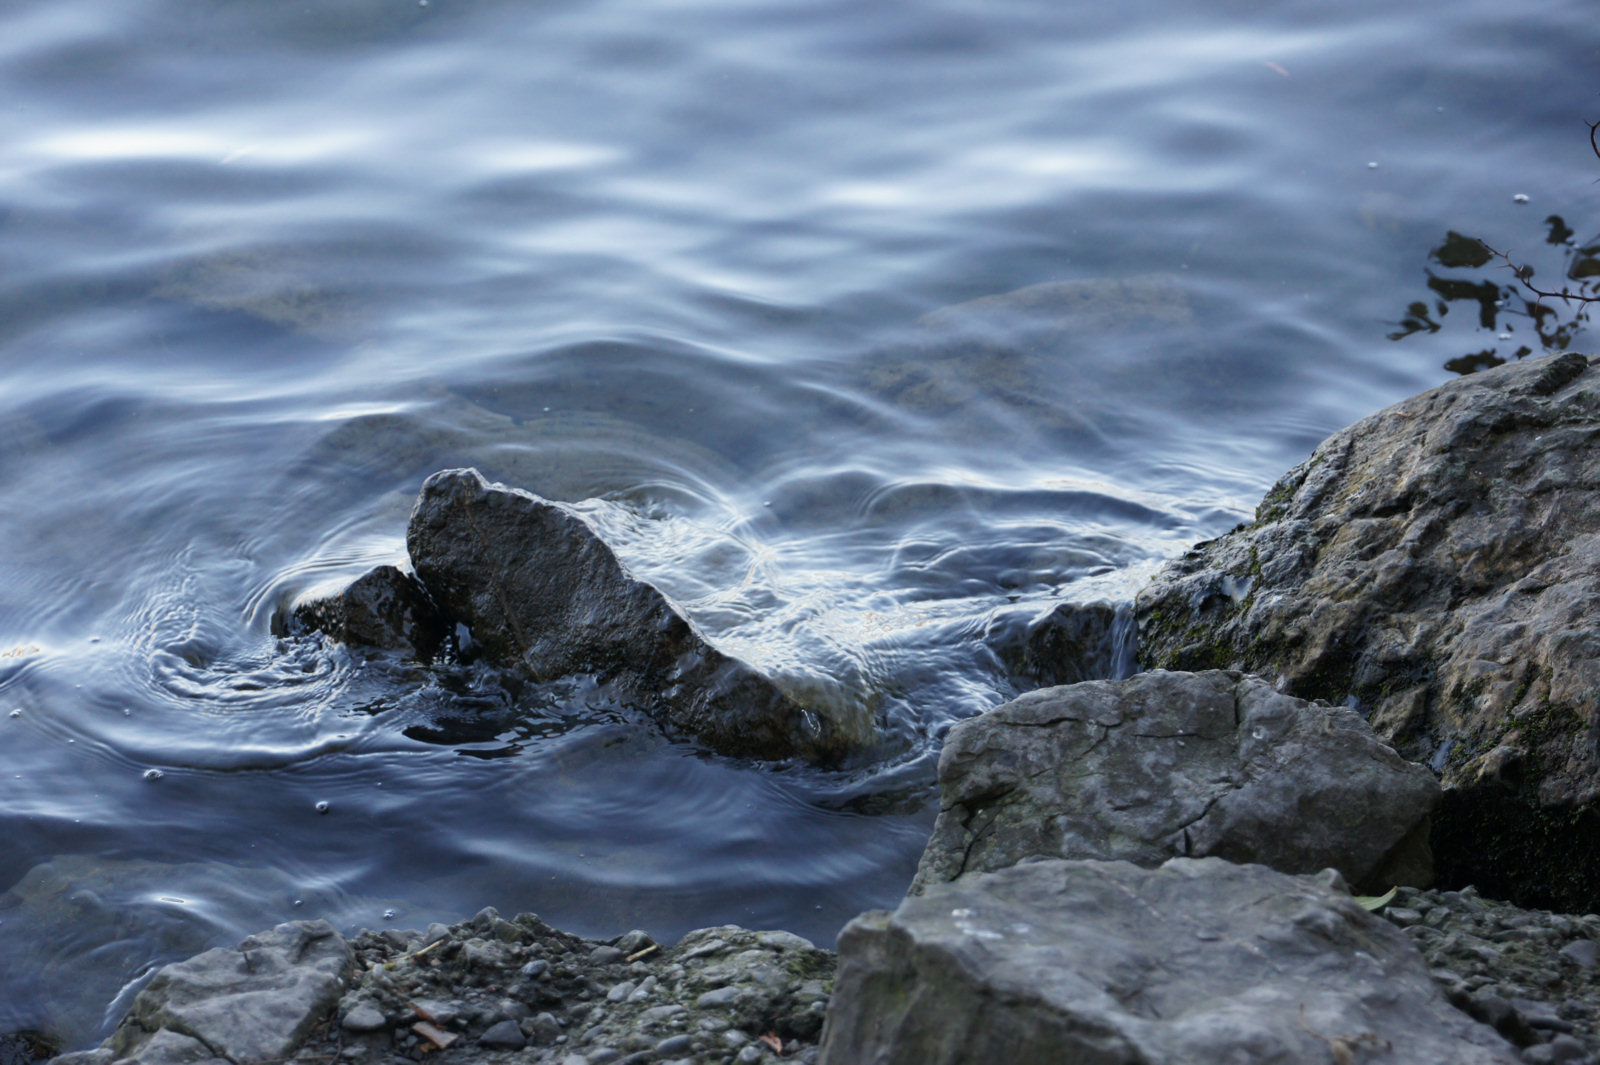 wp-001-Foto Art-am Wasser-02